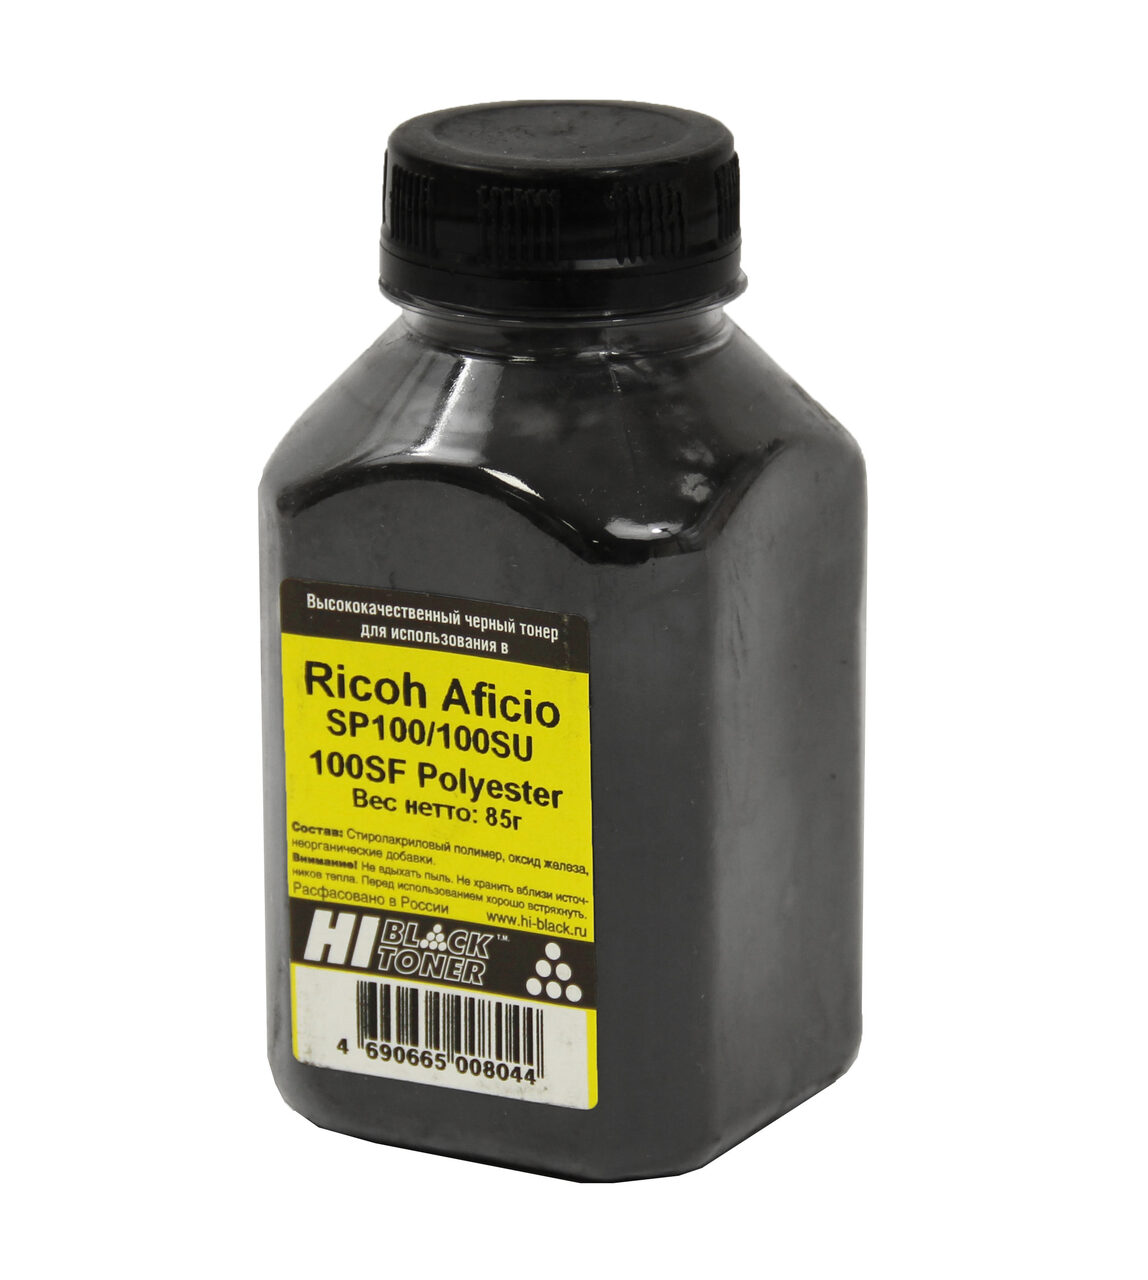 Тонер Hi-Black для Ricoh Aficio SP100/100SU/100SF, Polyester,Bk, 85 г, банка